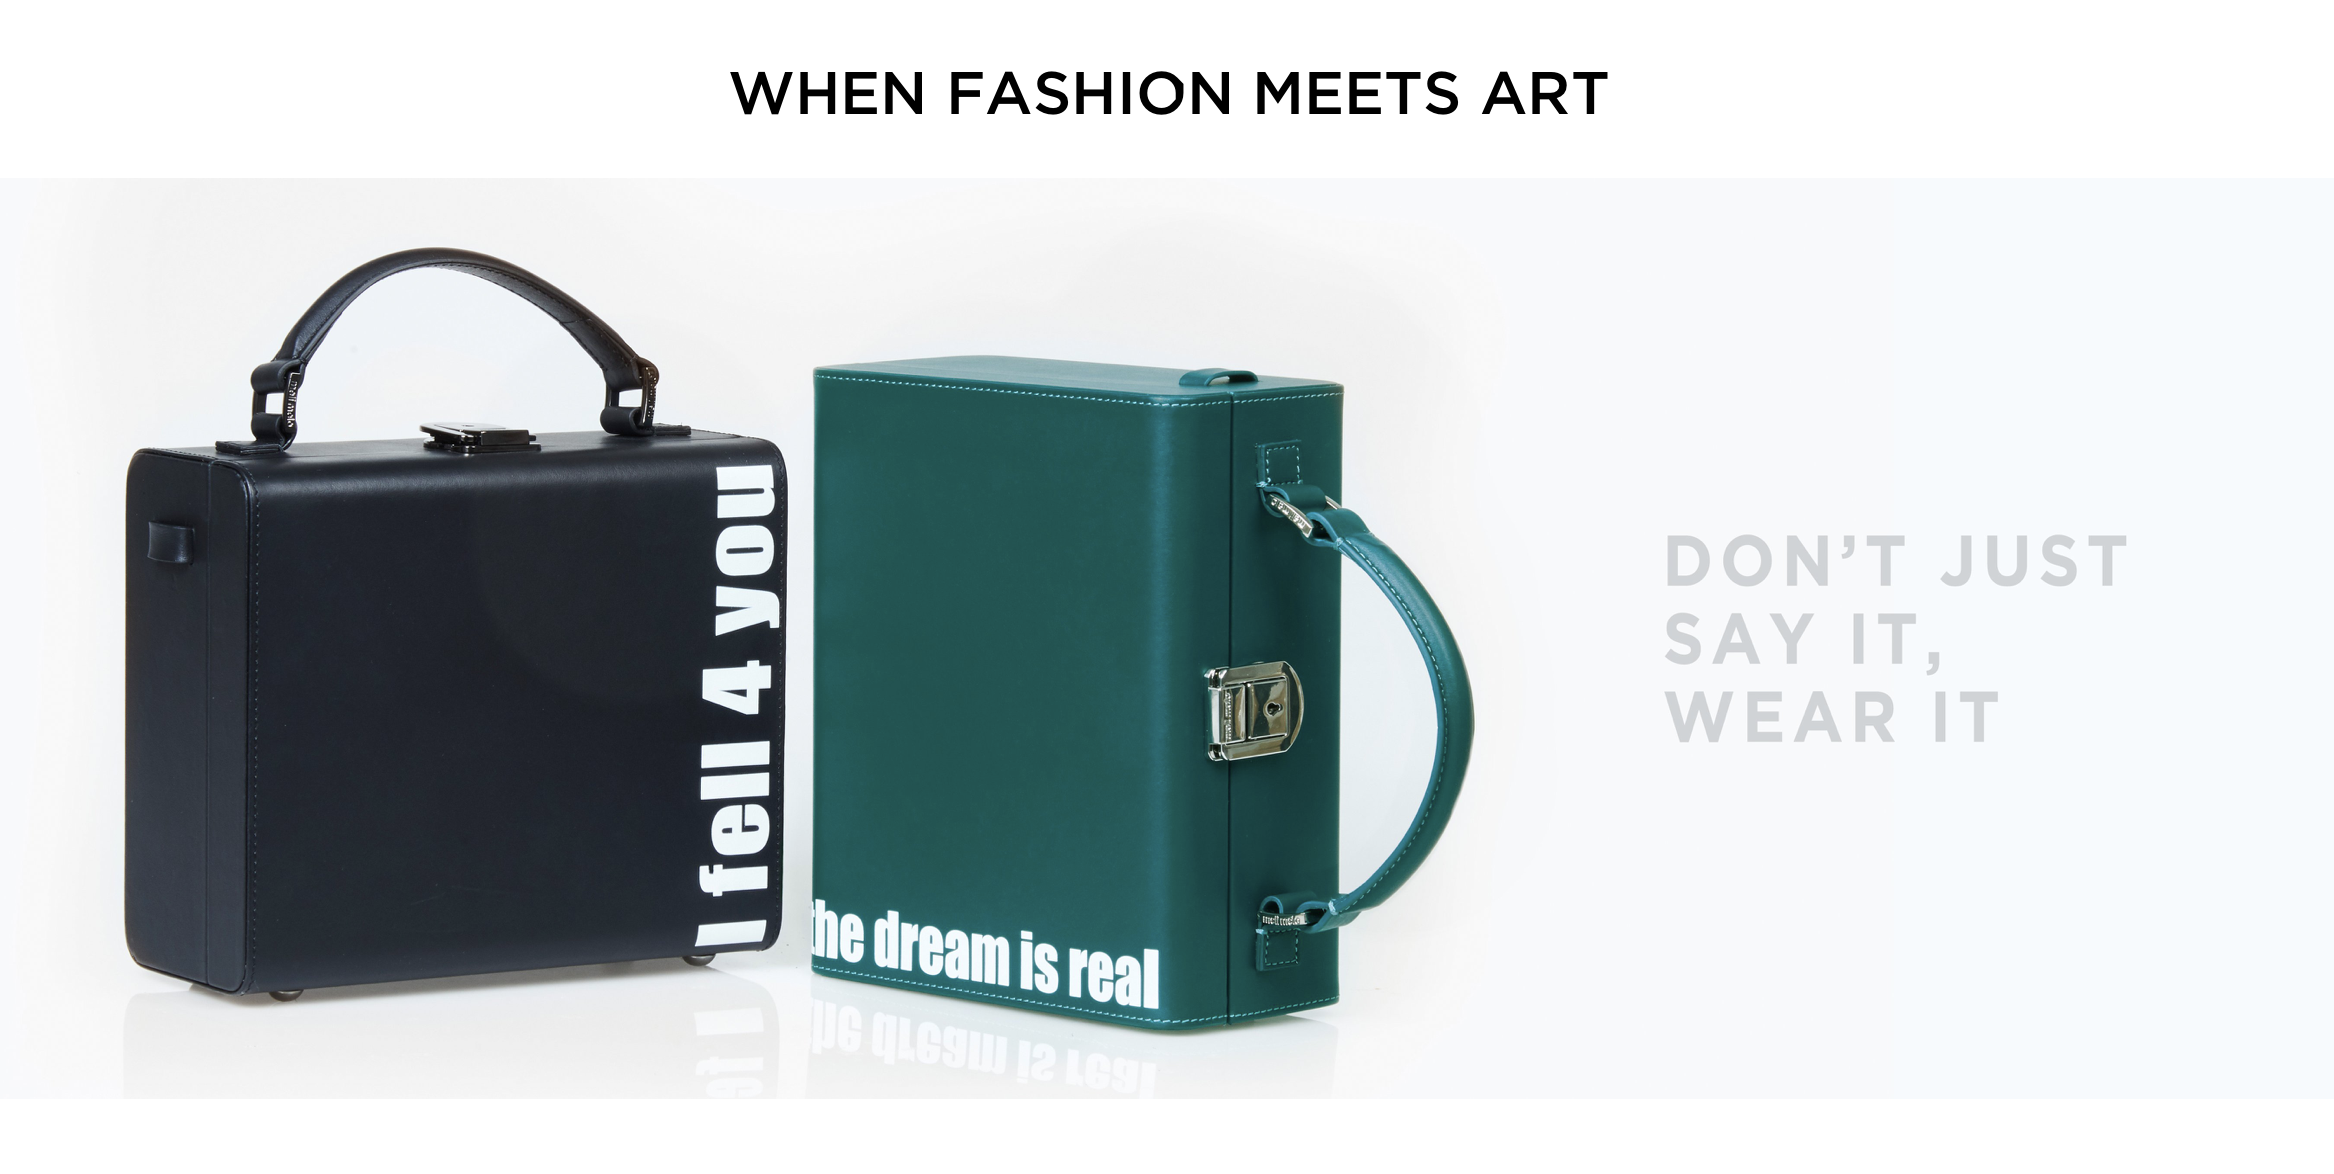 Olivia Steele x Meli Melo Art Bag Fashion